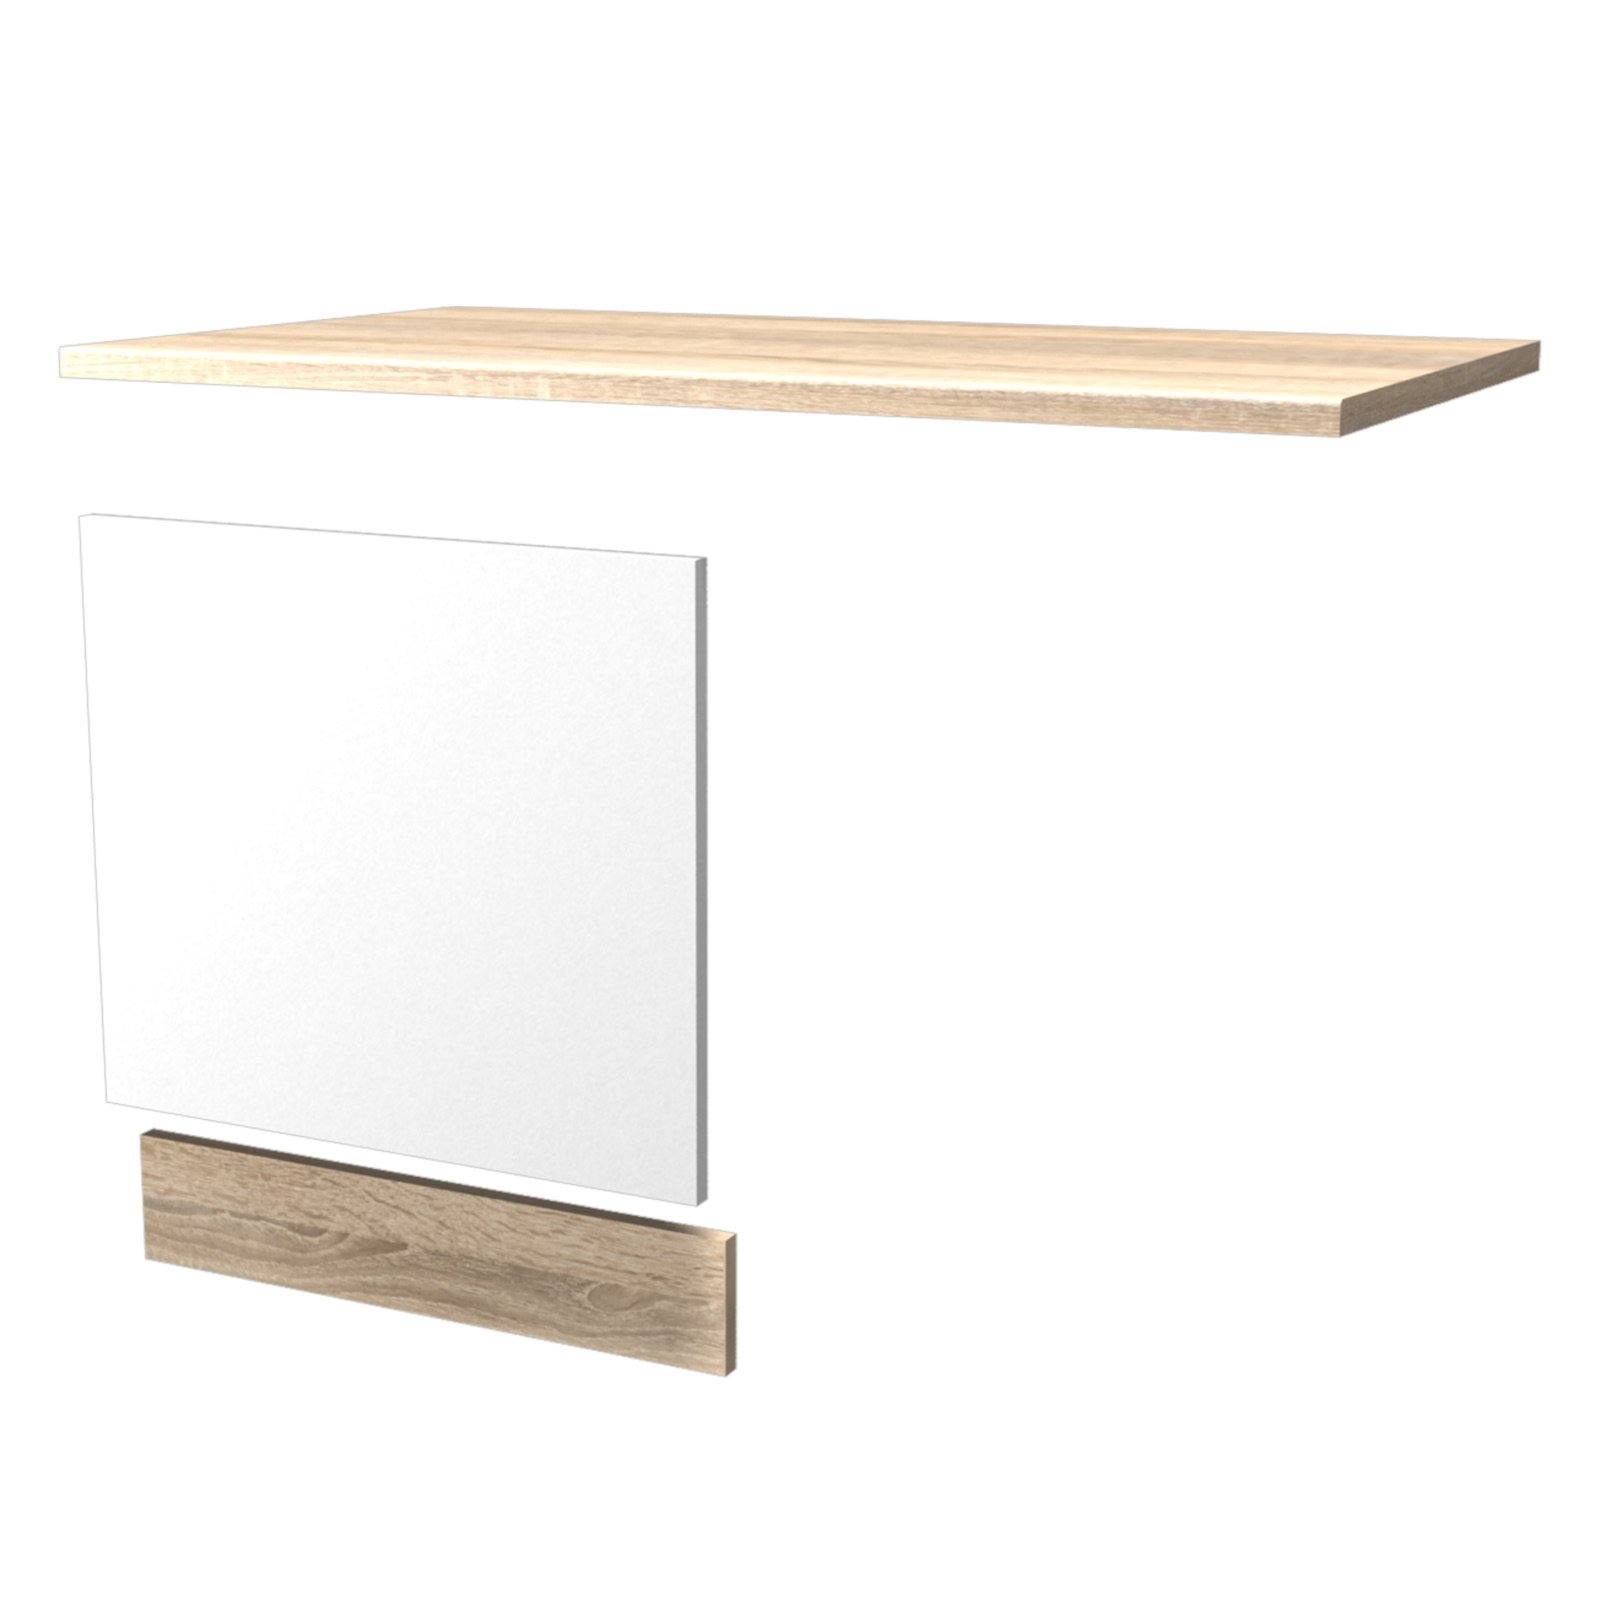 geschirrsp ler umbau samoa sonoma eiche 110 cm umbauschr nke einzelschr nke. Black Bedroom Furniture Sets. Home Design Ideas